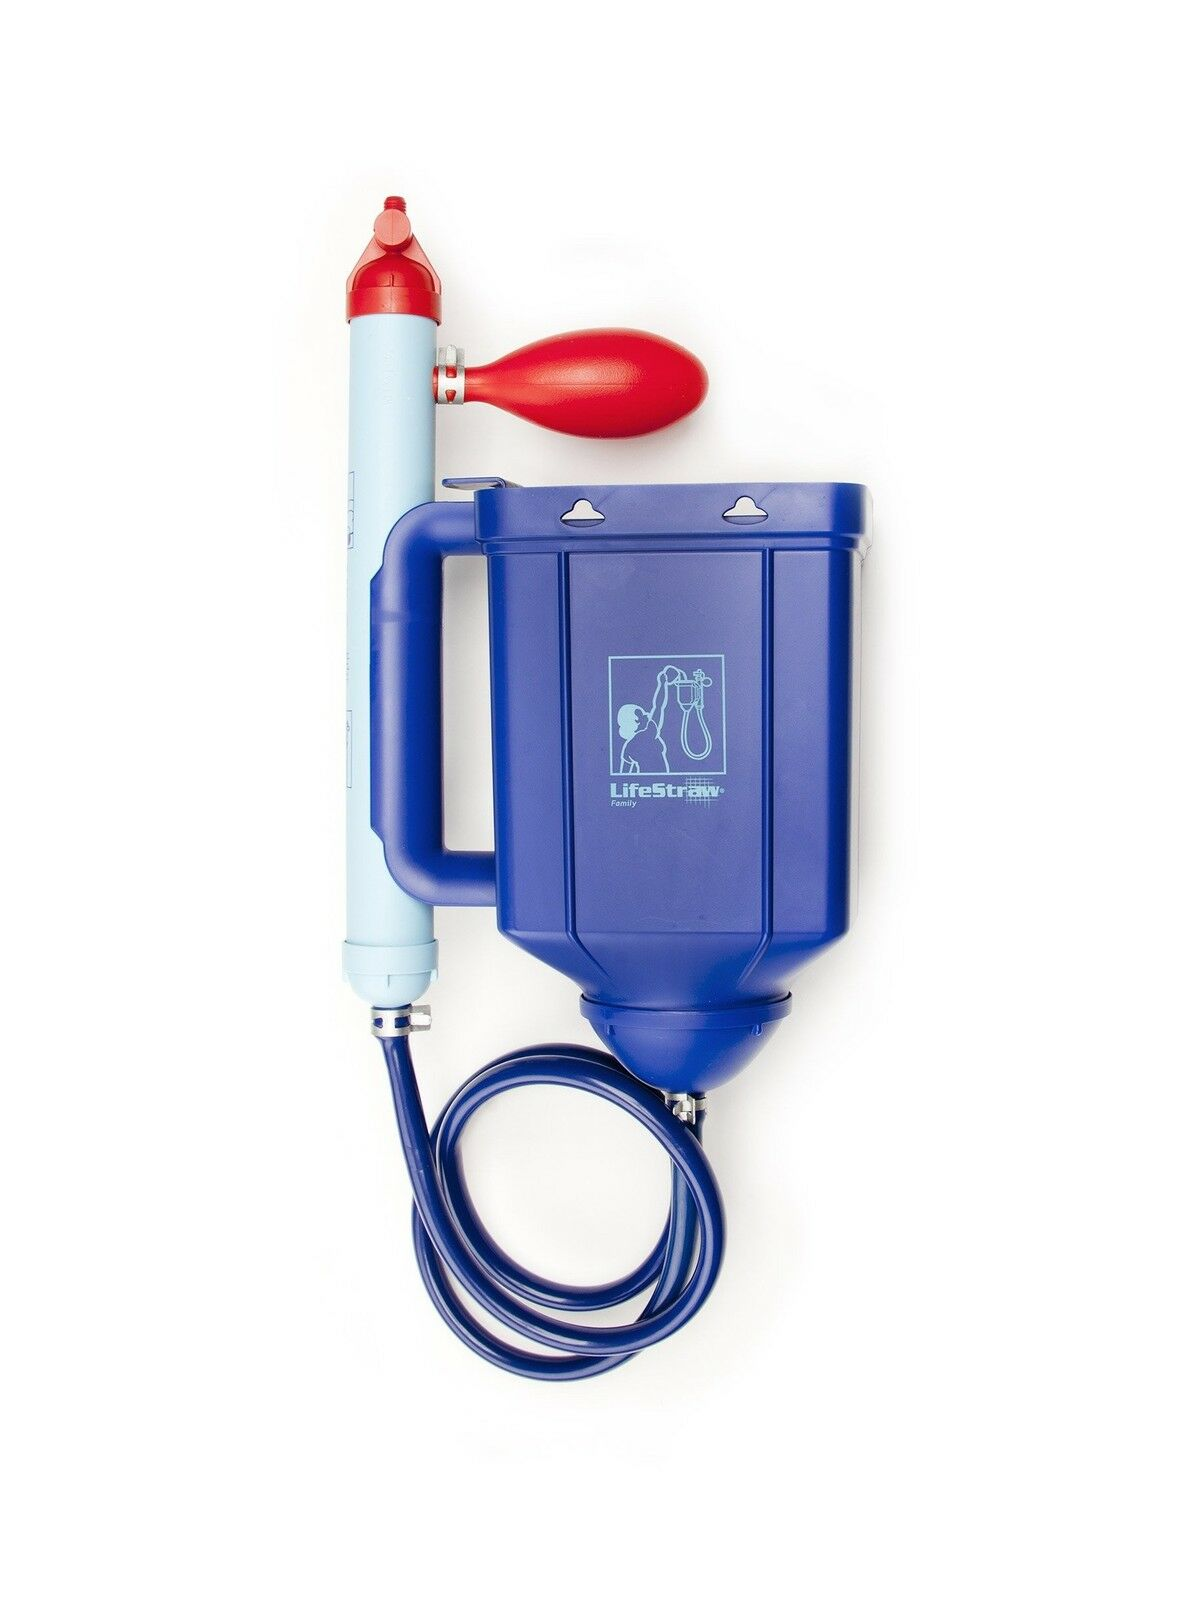 LifeStraw Family 1.0 Water Purifier Free Shipping